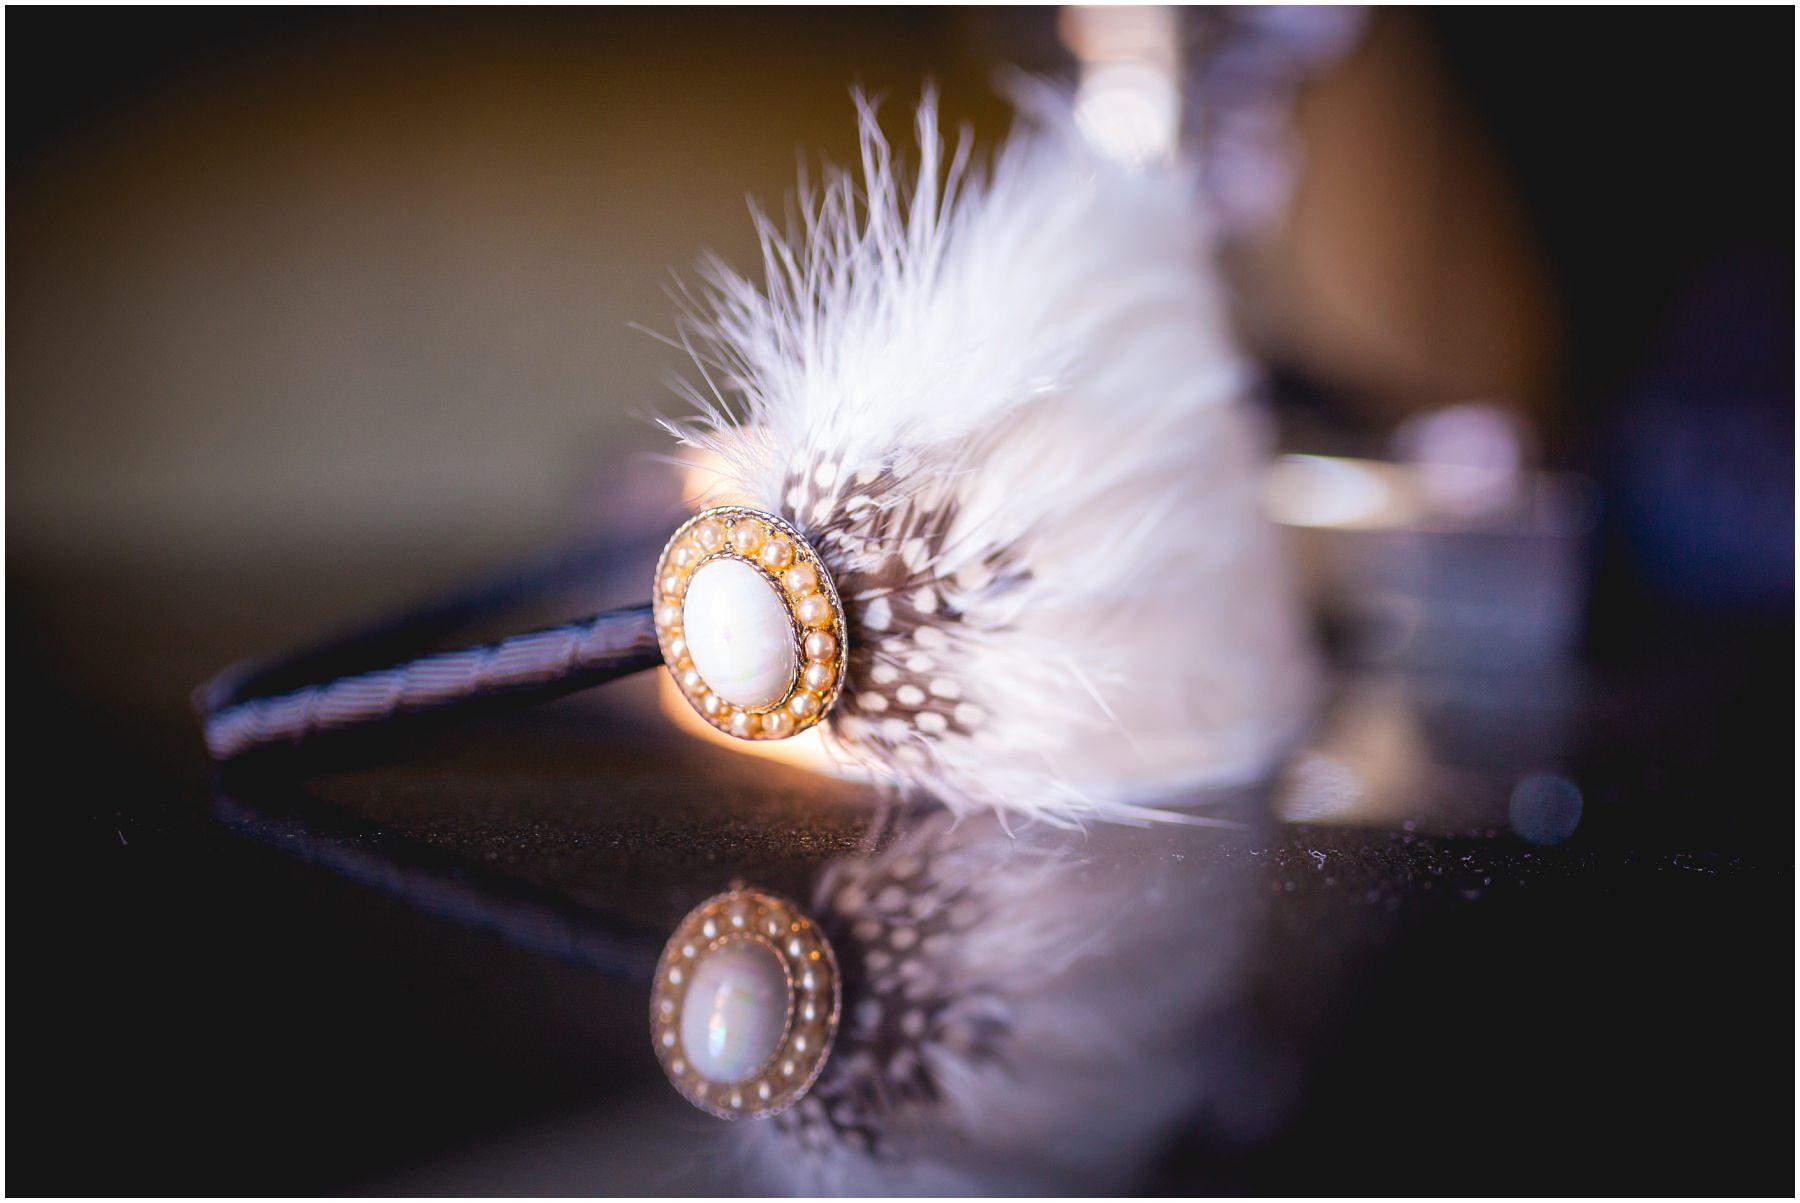 A hair accessory sat on a bedside table